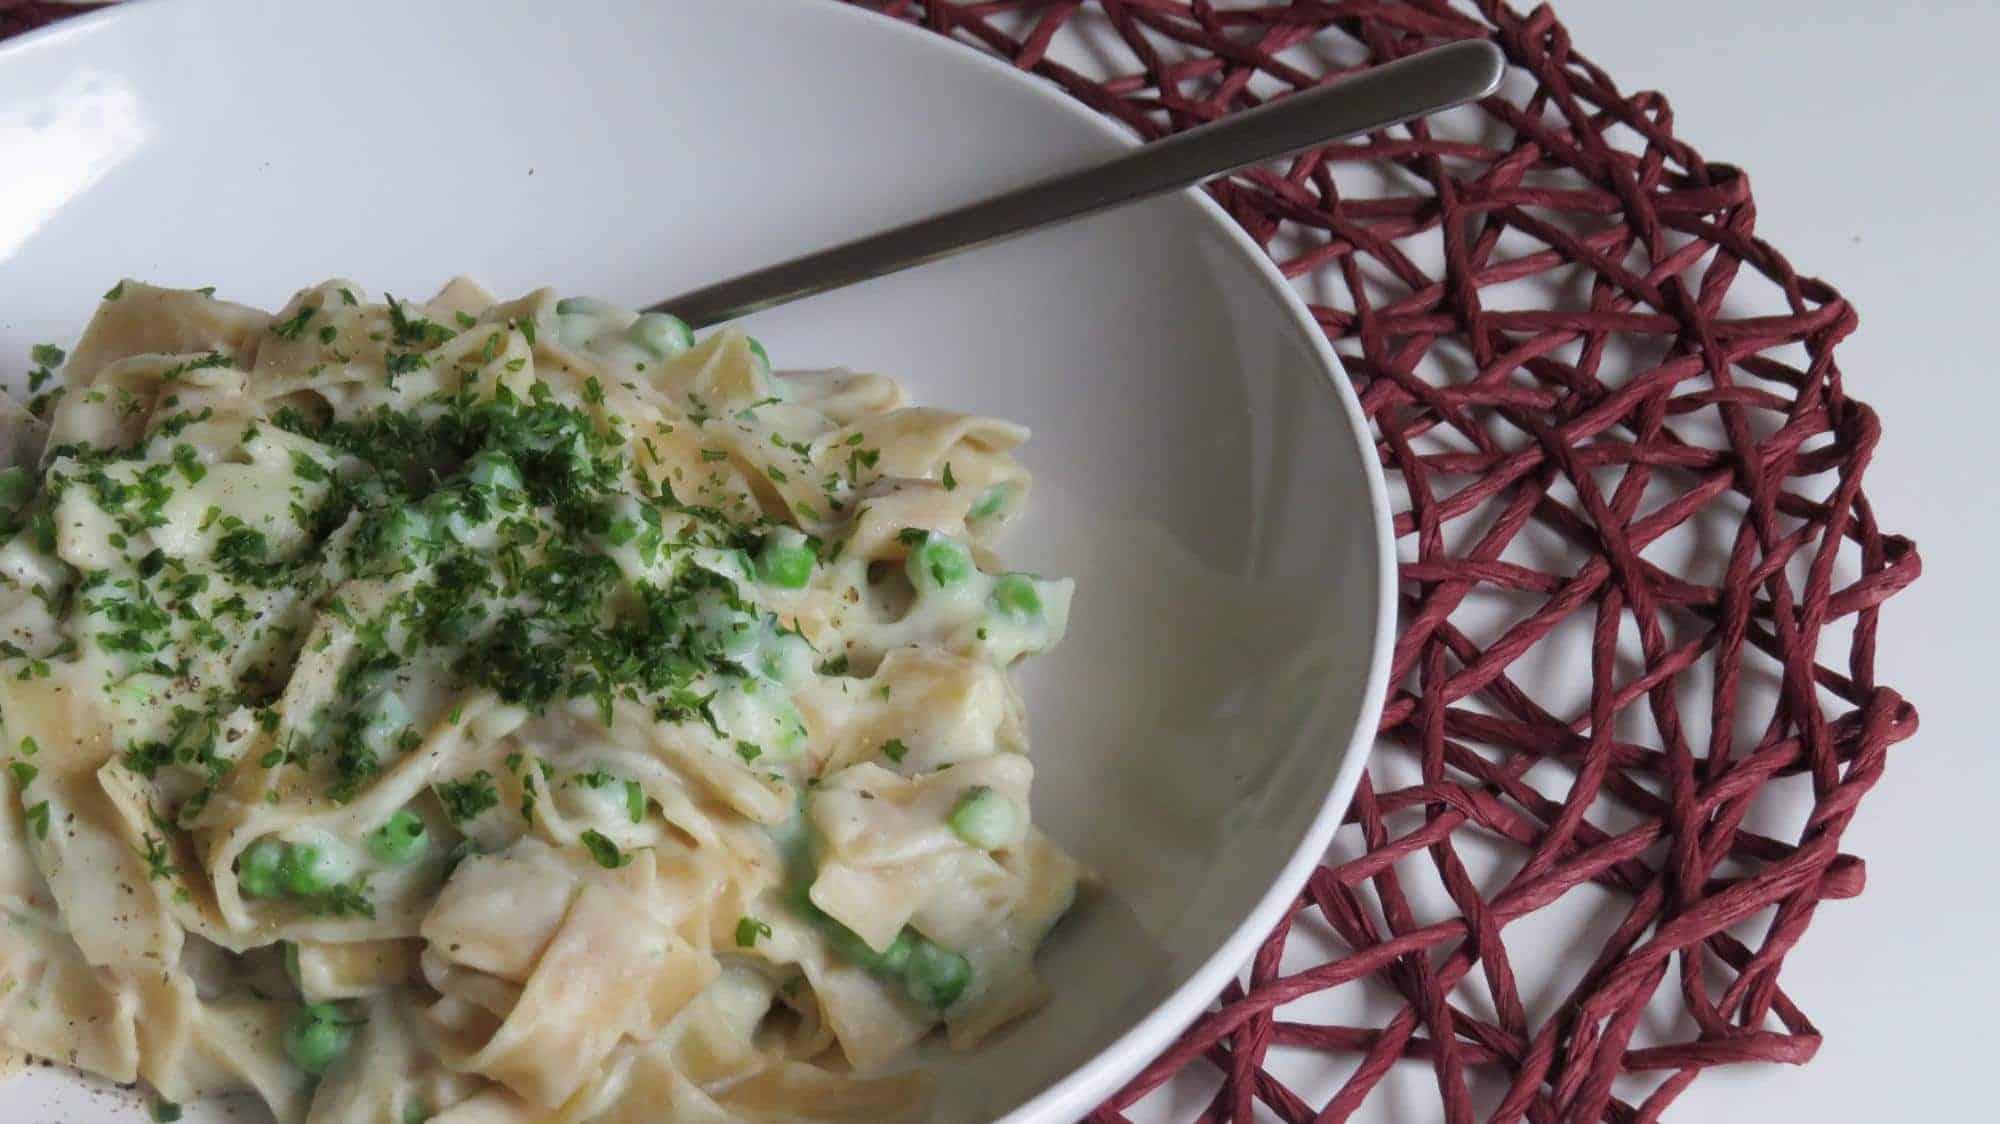 Vegane Blumenkohl-Alfredo-Sauce mit Pasta